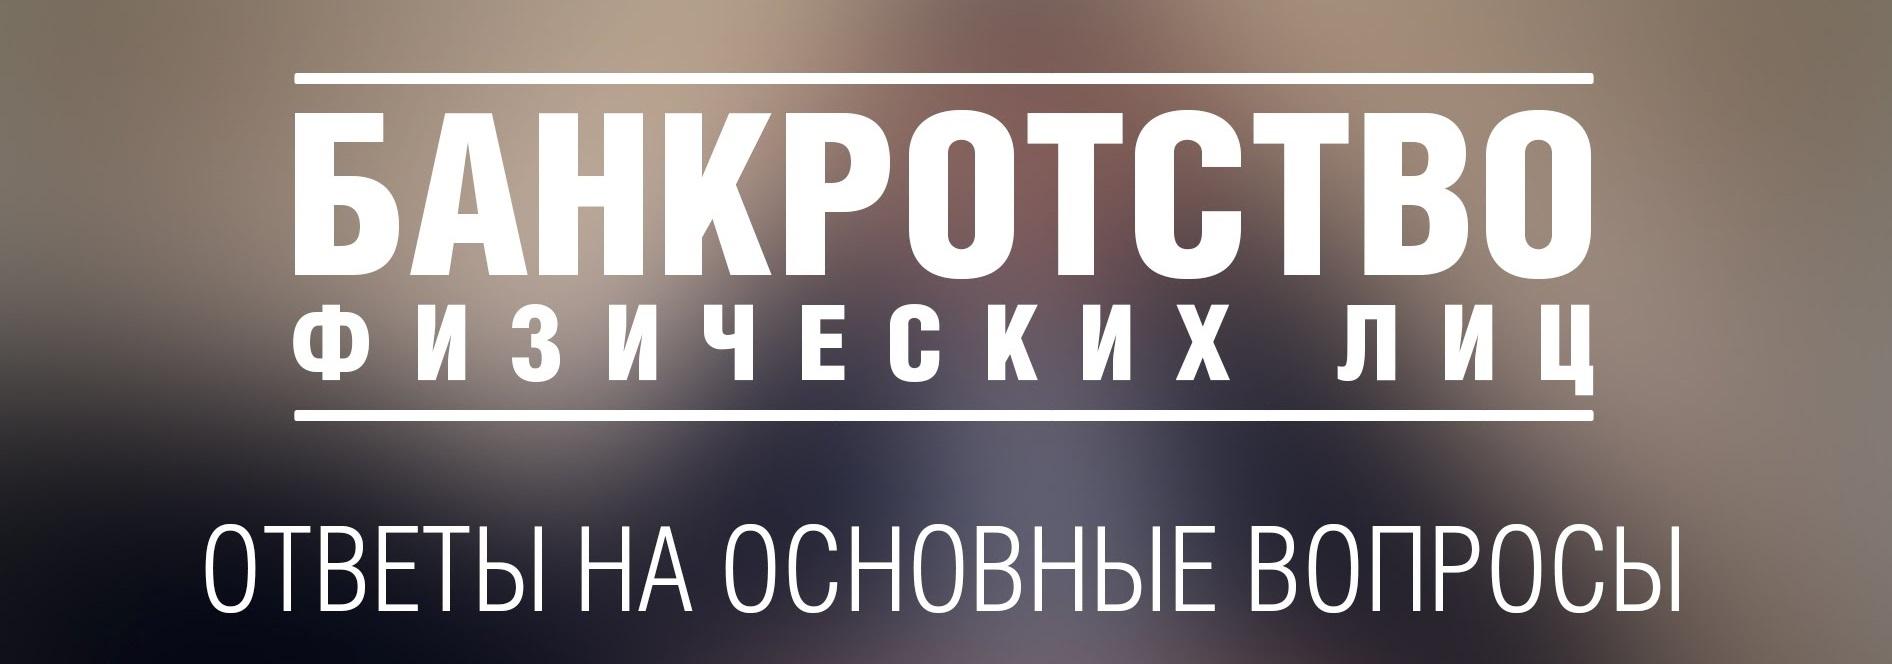 Информационный портал vbankrote.ru